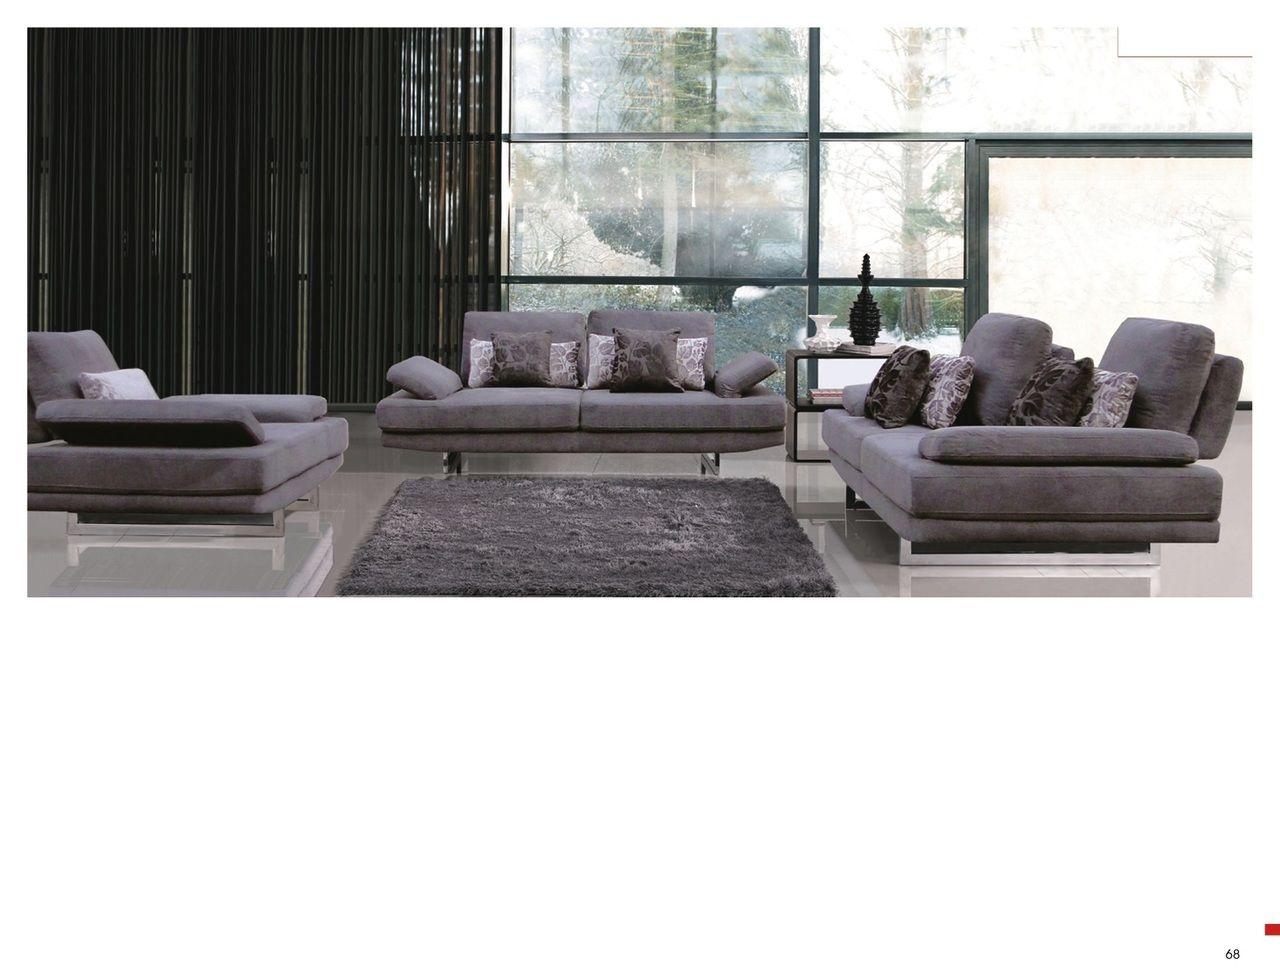 Awe Inspiring Mng Modern Living 1174 Microfiber Sofa Set In 2019 Beatyapartments Chair Design Images Beatyapartmentscom